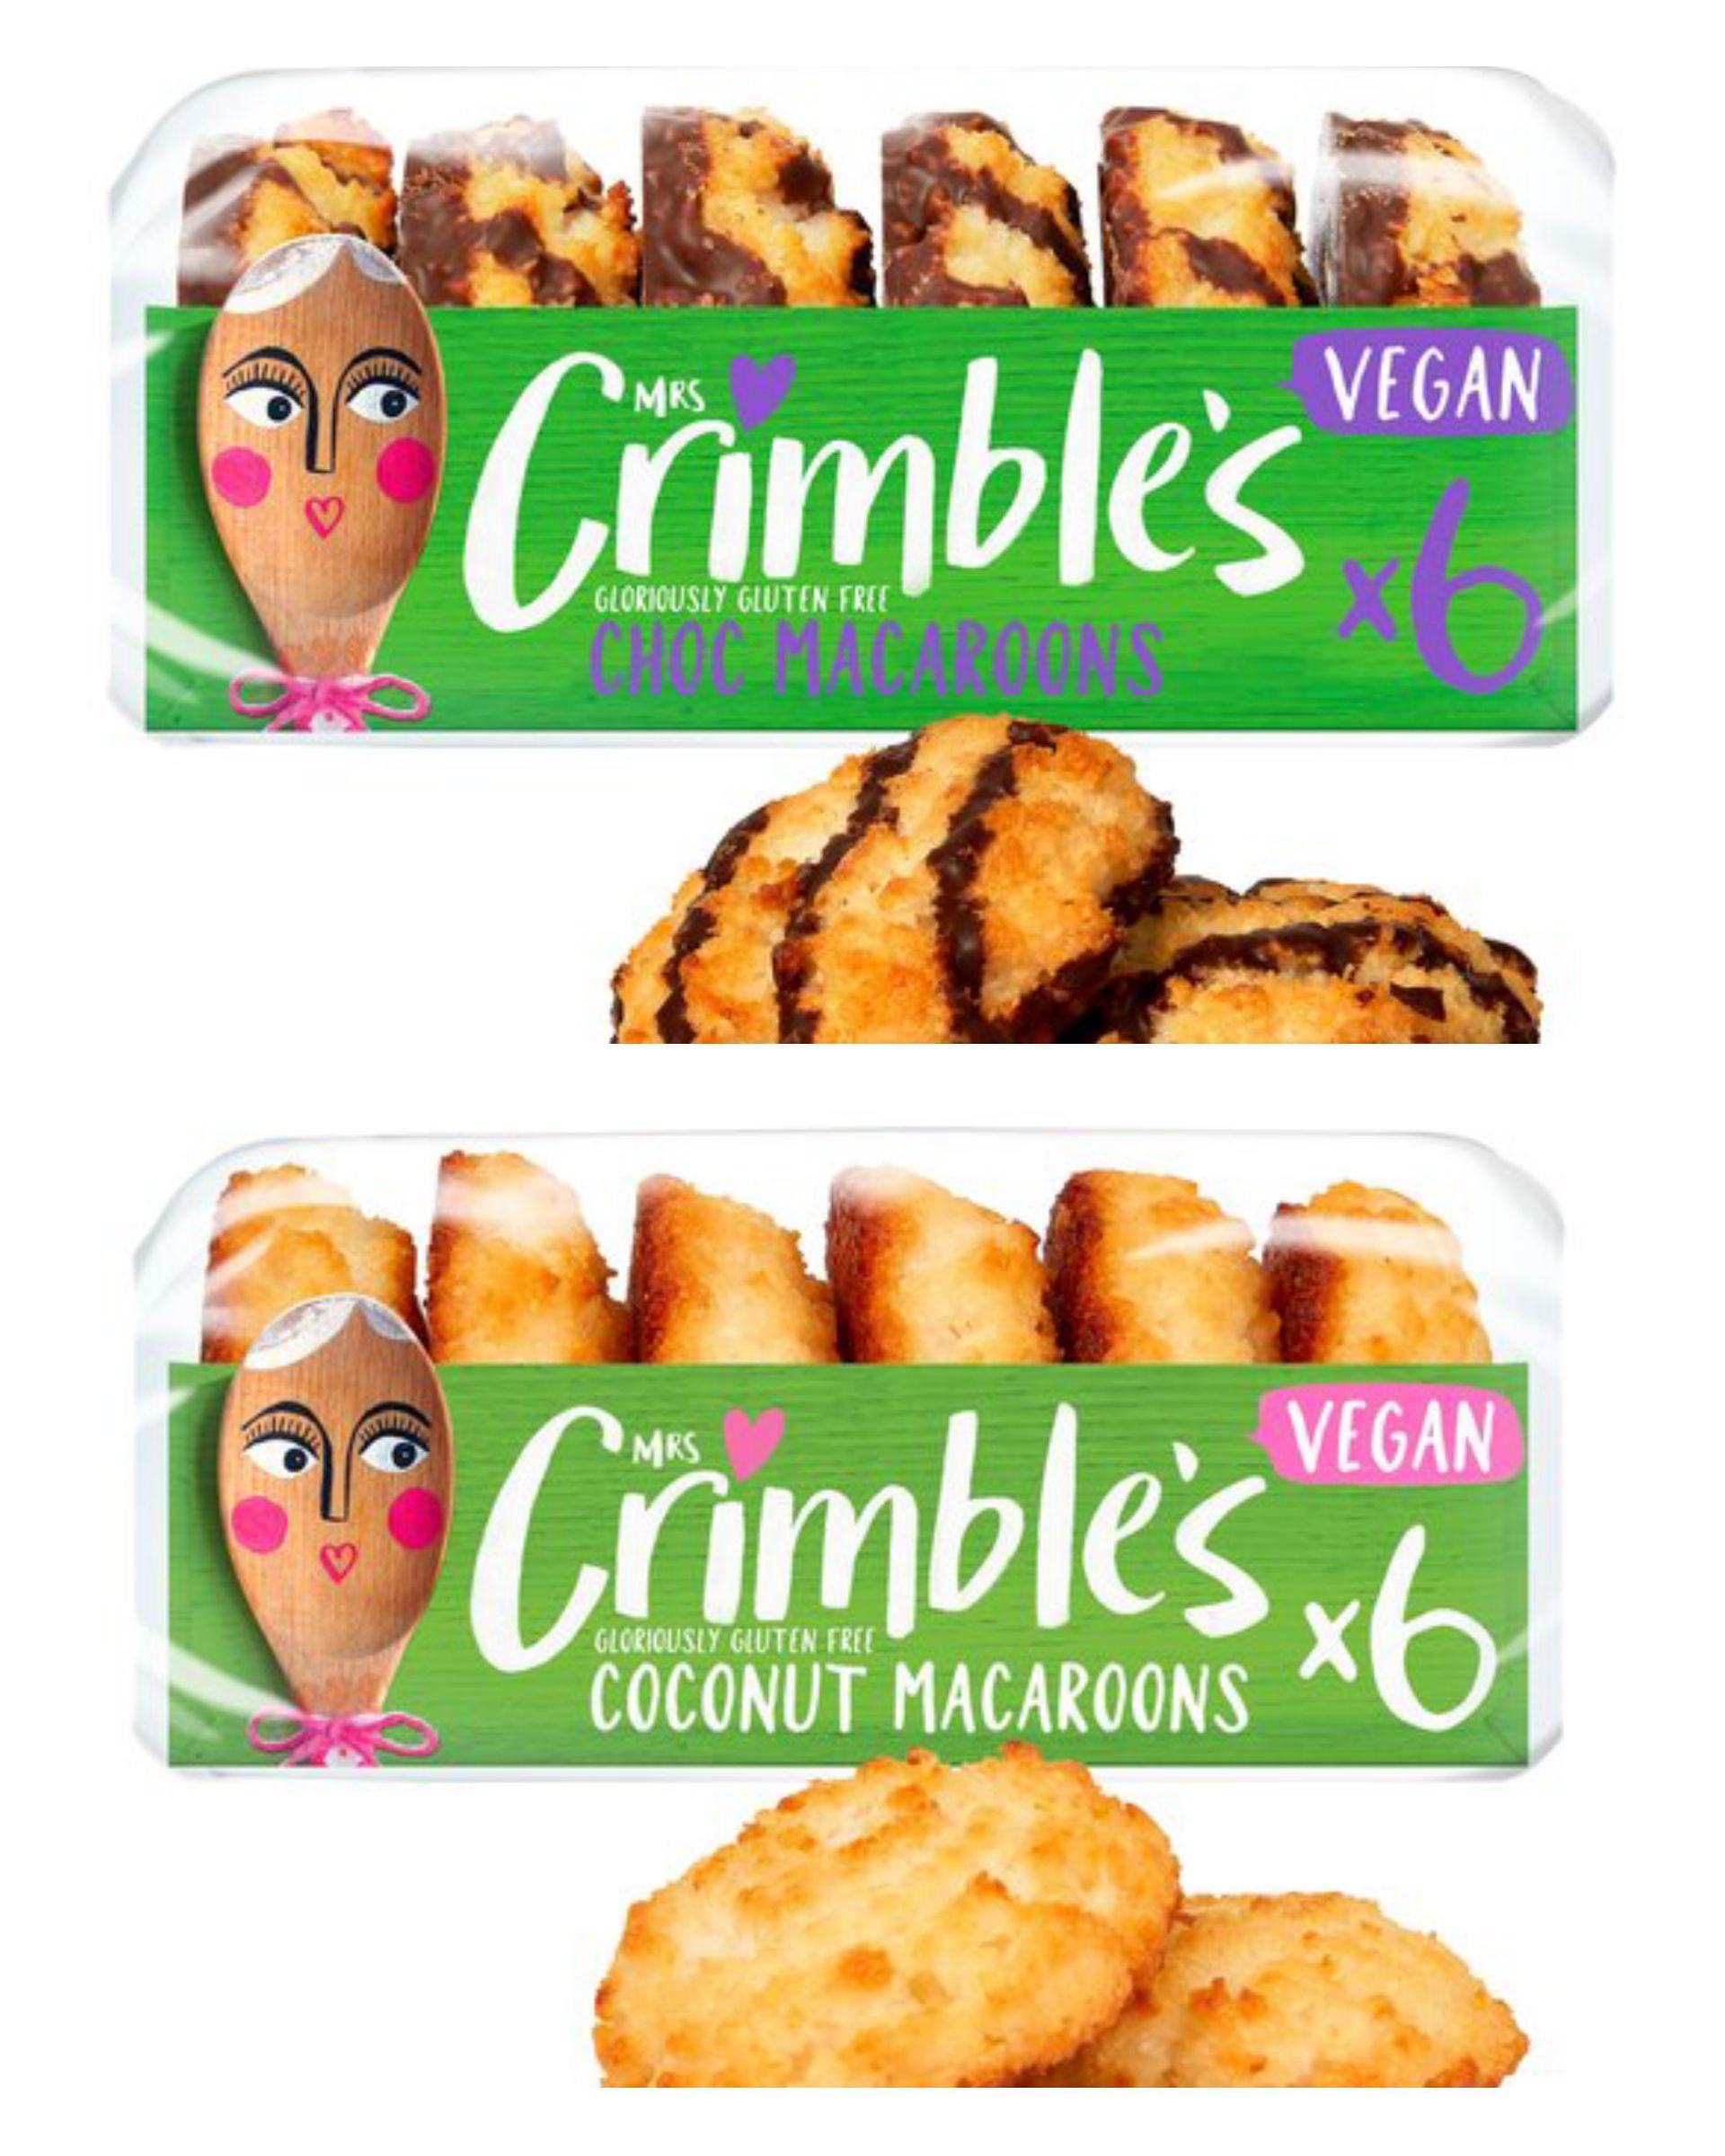 Mrs Crimbles 6 Gluten Free Vegan Chocolate Macaroon 195G/Gluten free £1 @ Tesco clubcard price